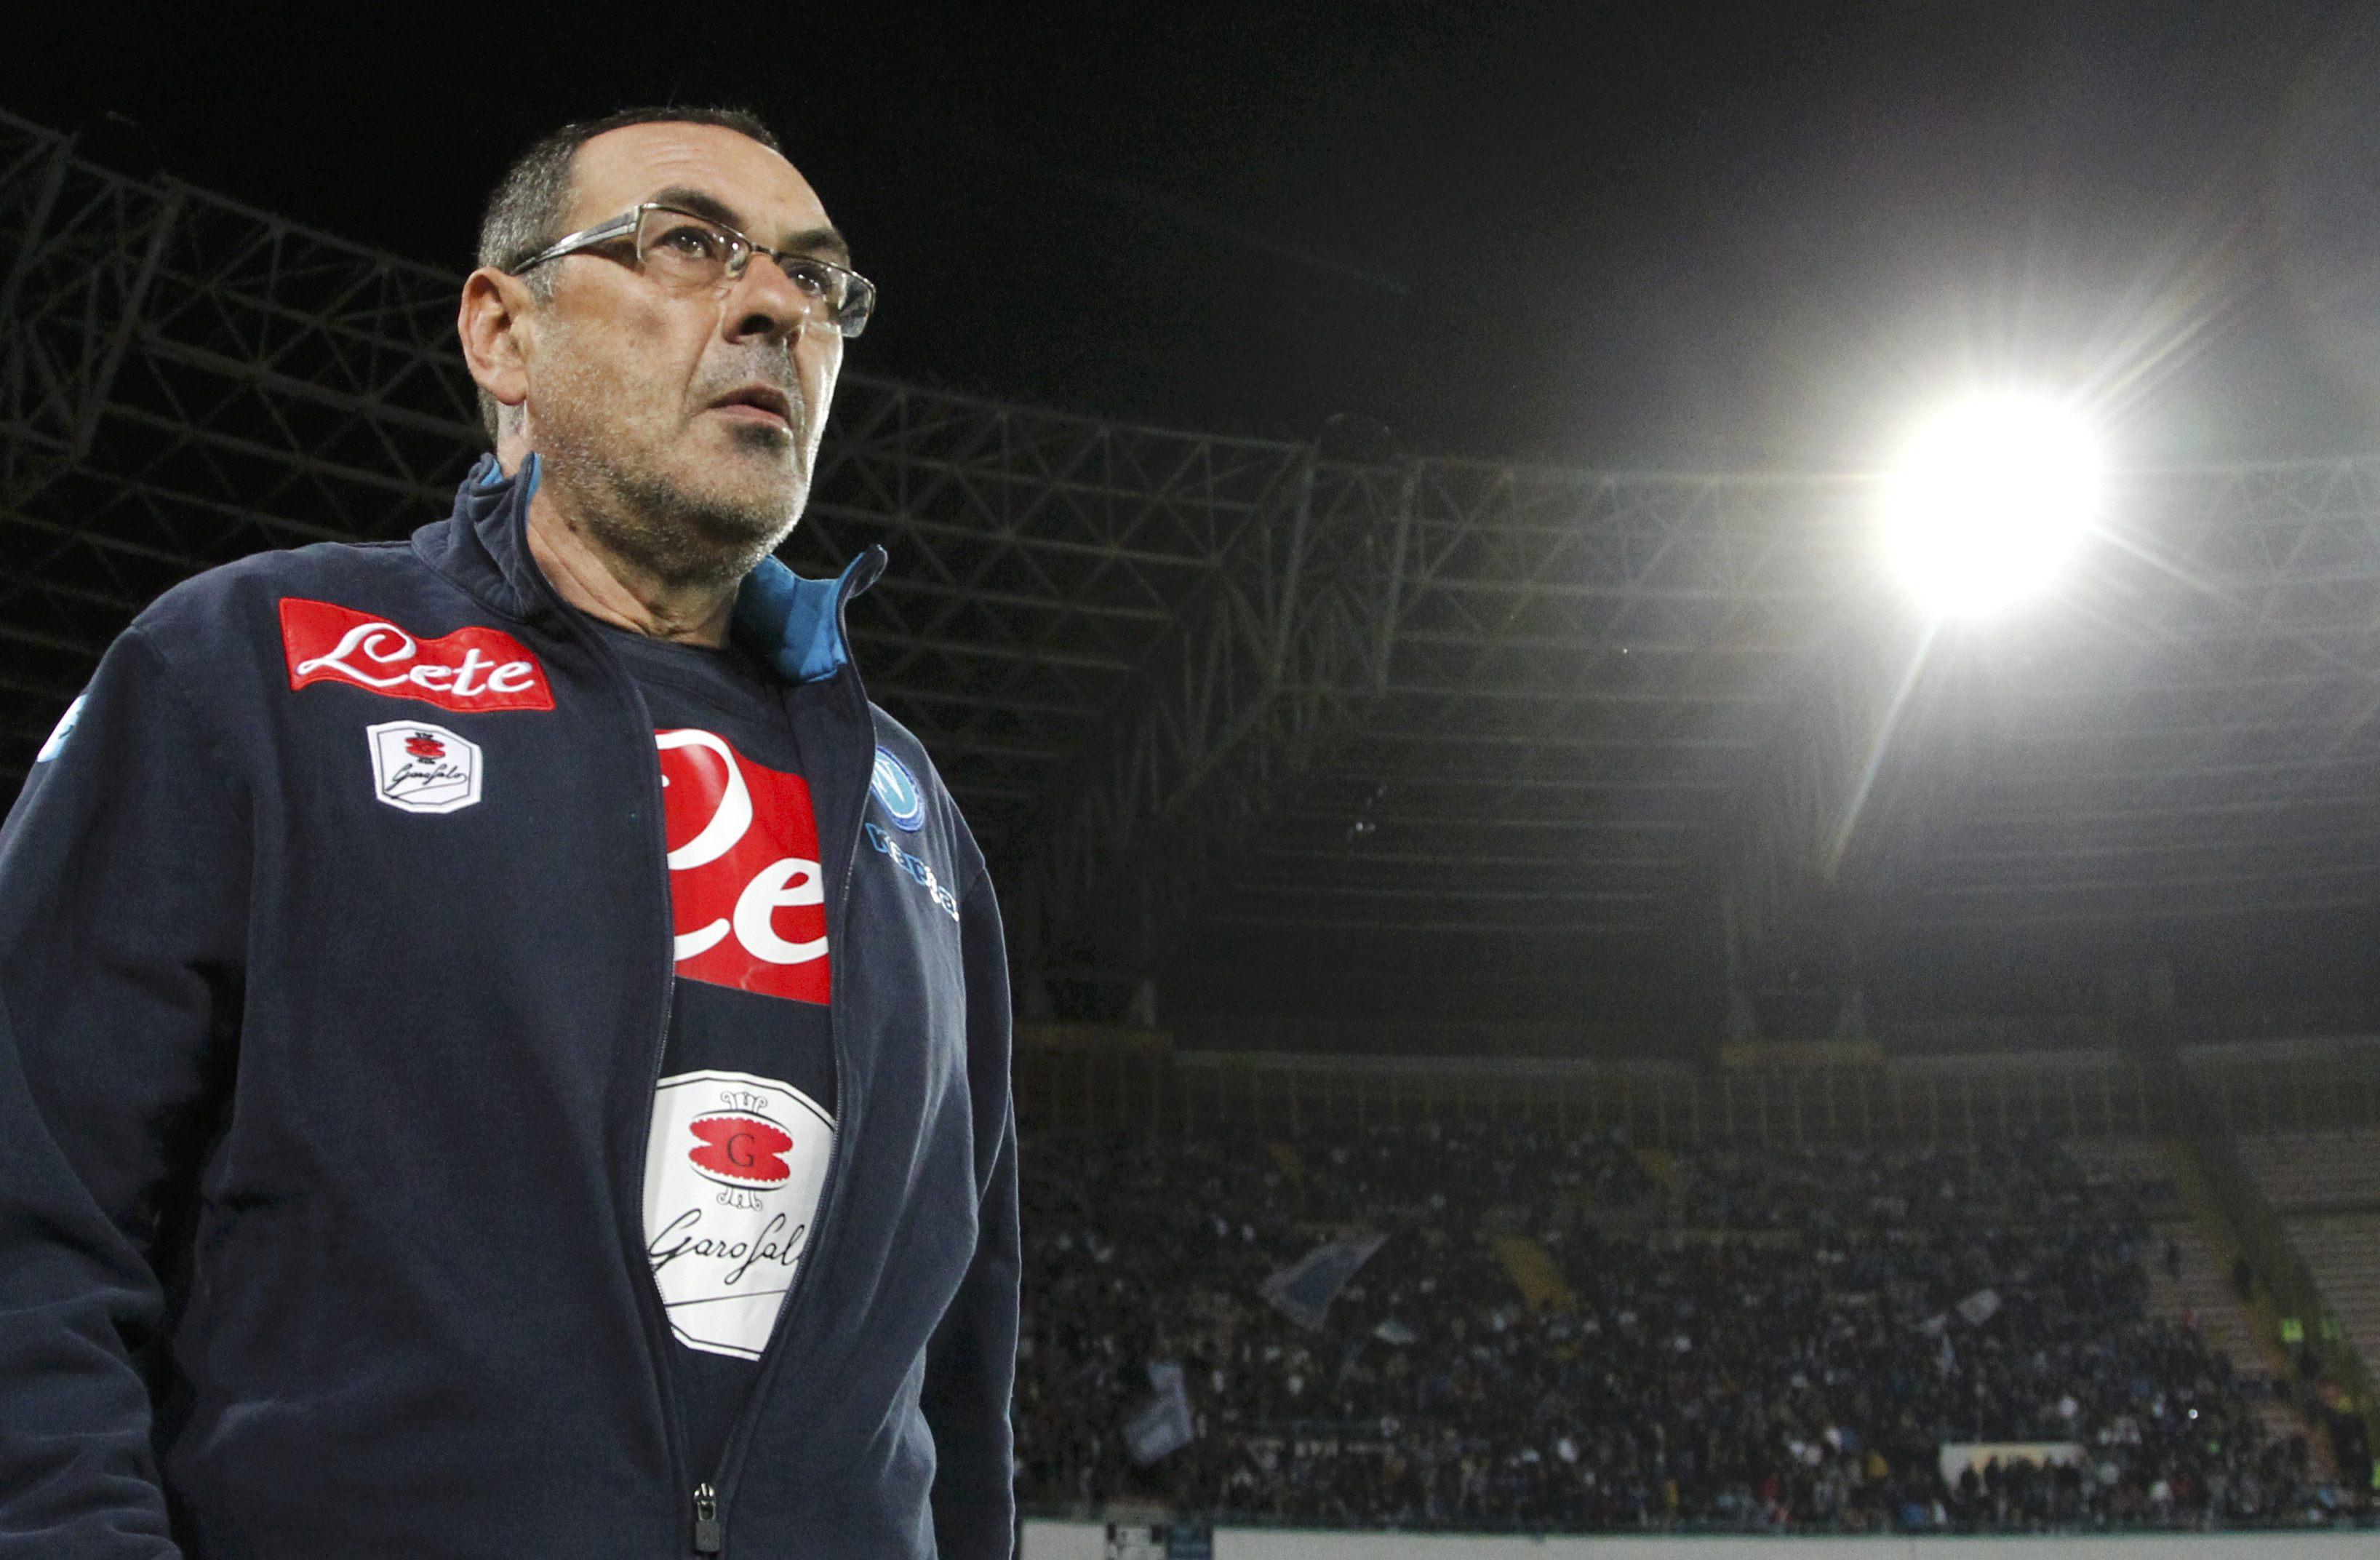 Football Soccer - Napoli v Bologna - Italian Serie A - San Paolo stadium, Naples, Italy - 19/04/16